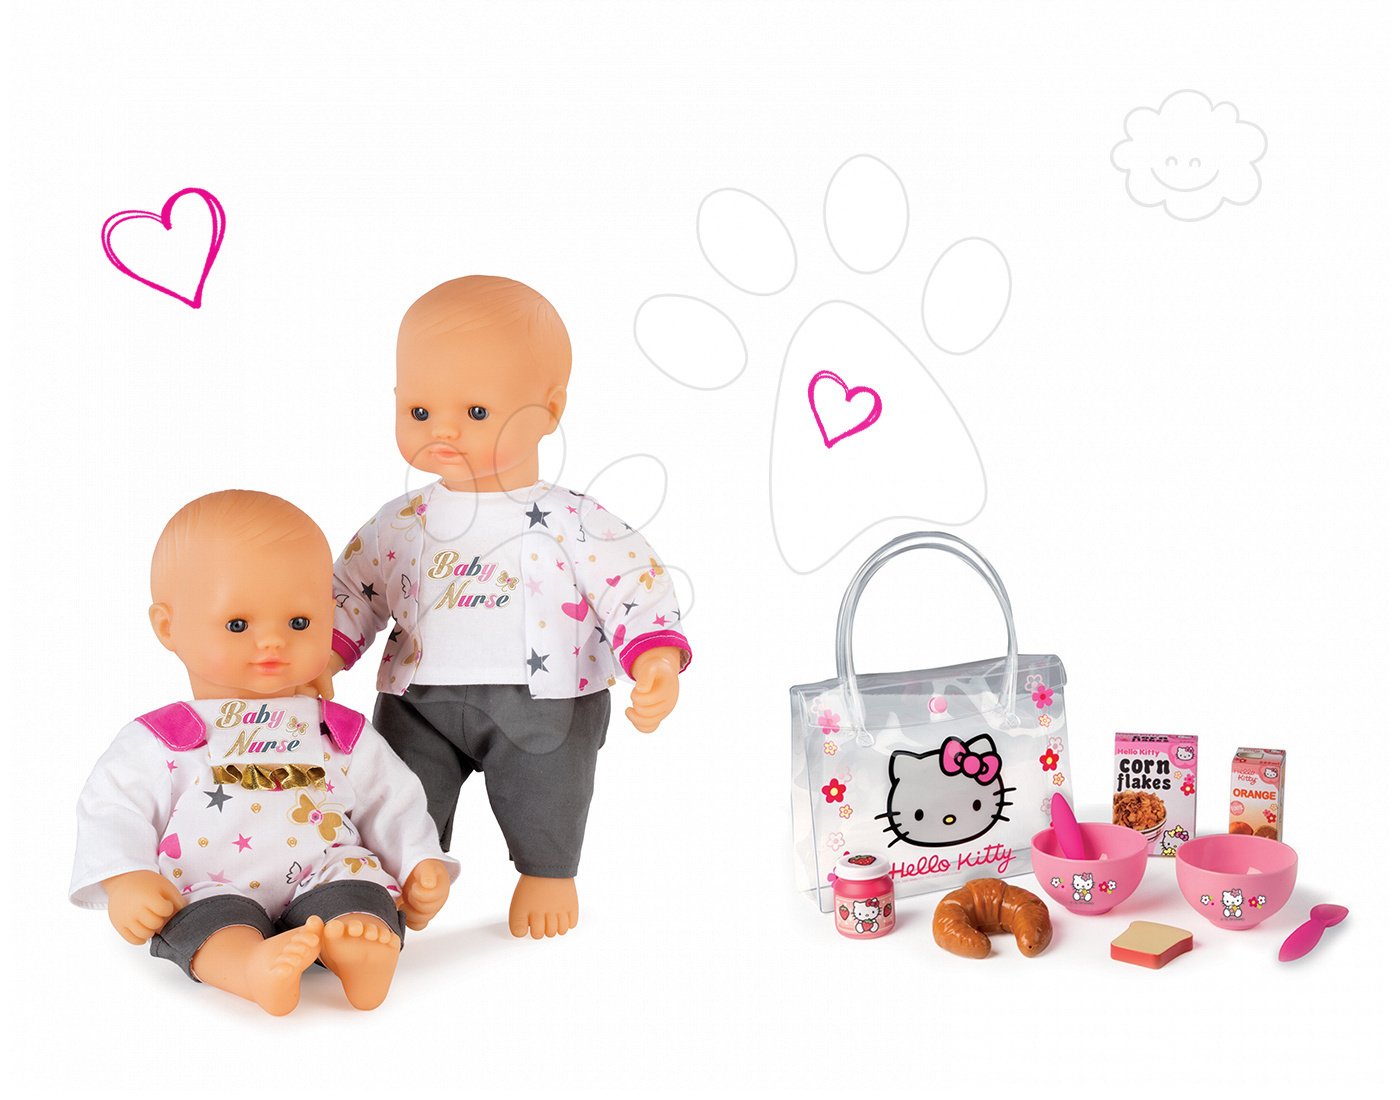 Smoby set panenka Baby Nurse Zlatá edice a snídaňový set Hello Kitty 220100-17